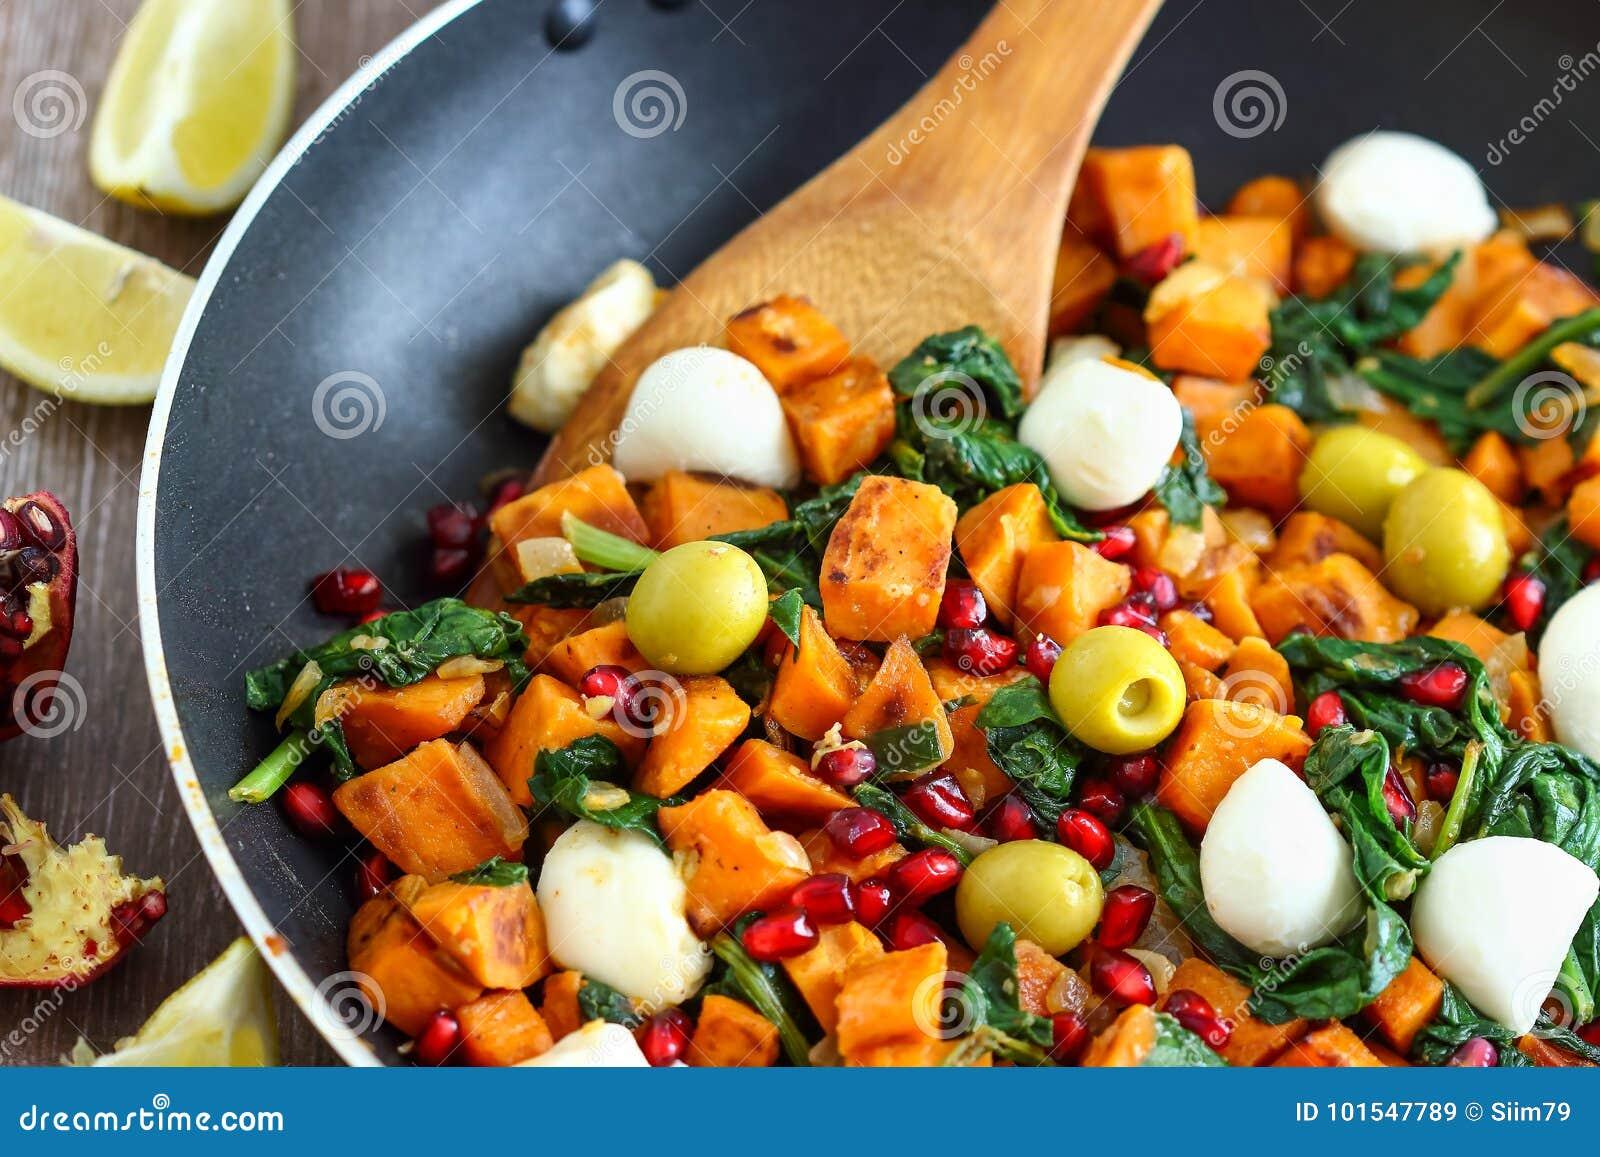 Süßkartoffel-Frühstücks-Hasch